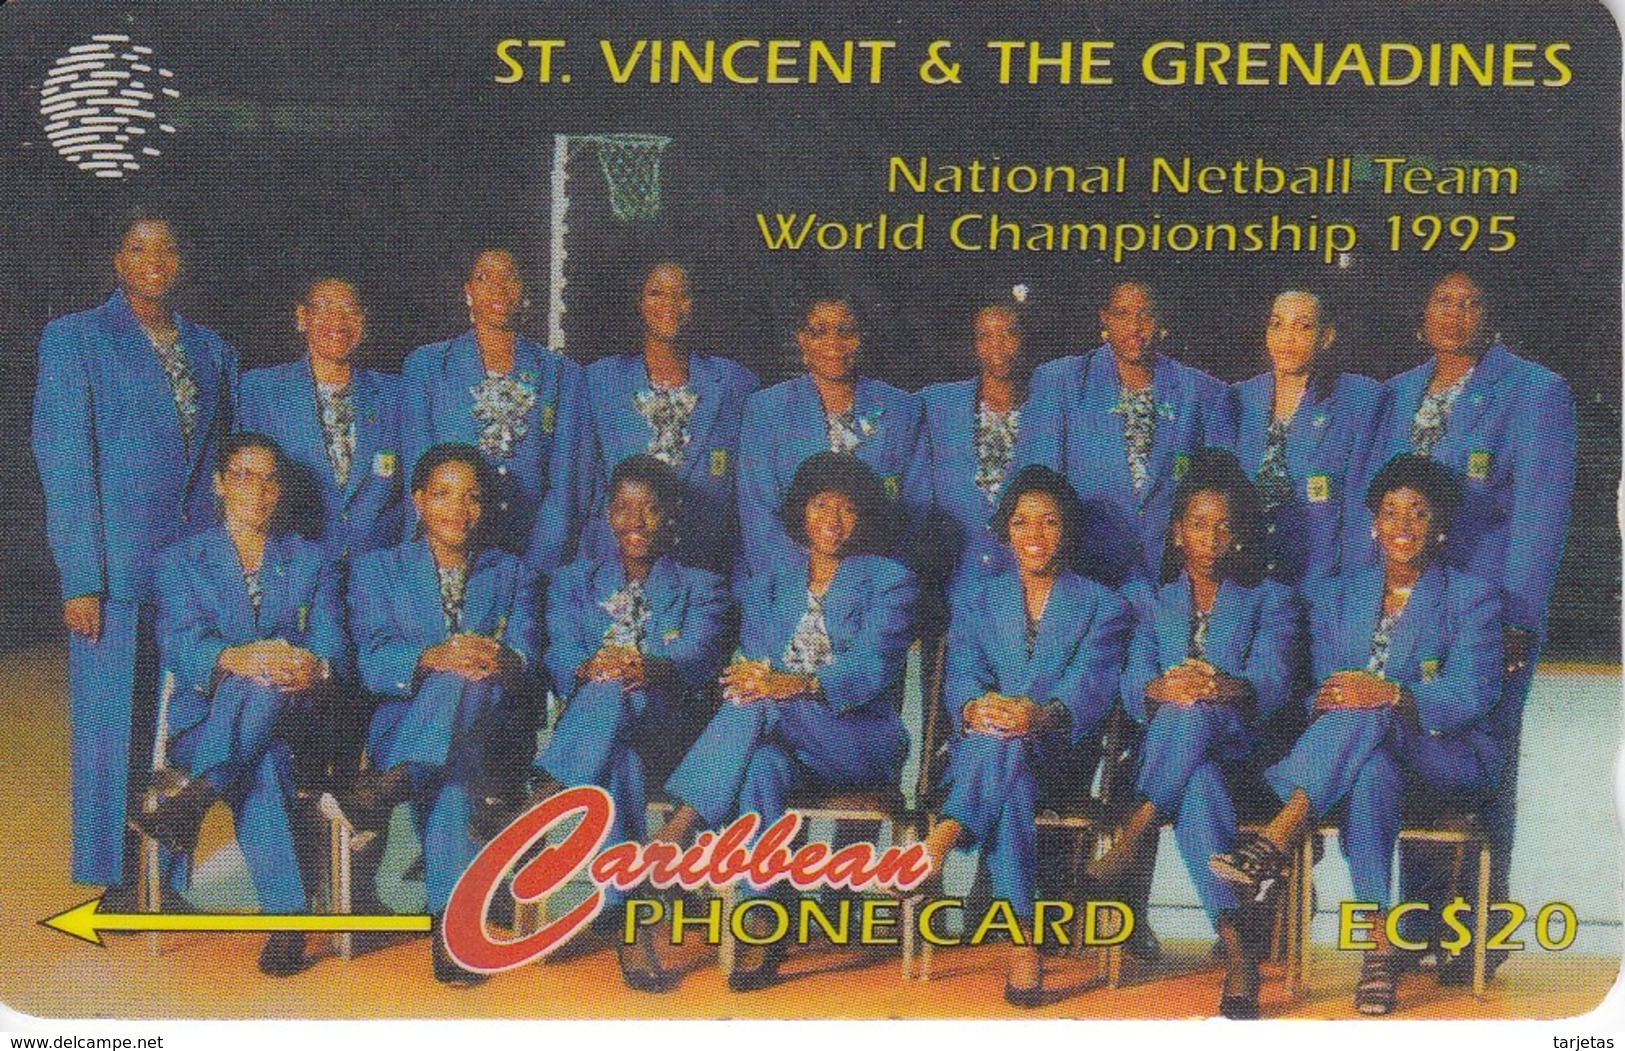 TARJETA DE ST. VINCENT & GRENADINES DE NATIONAL NETBALL TEAM 199SVDB - San Vicente Y Las Granadinas